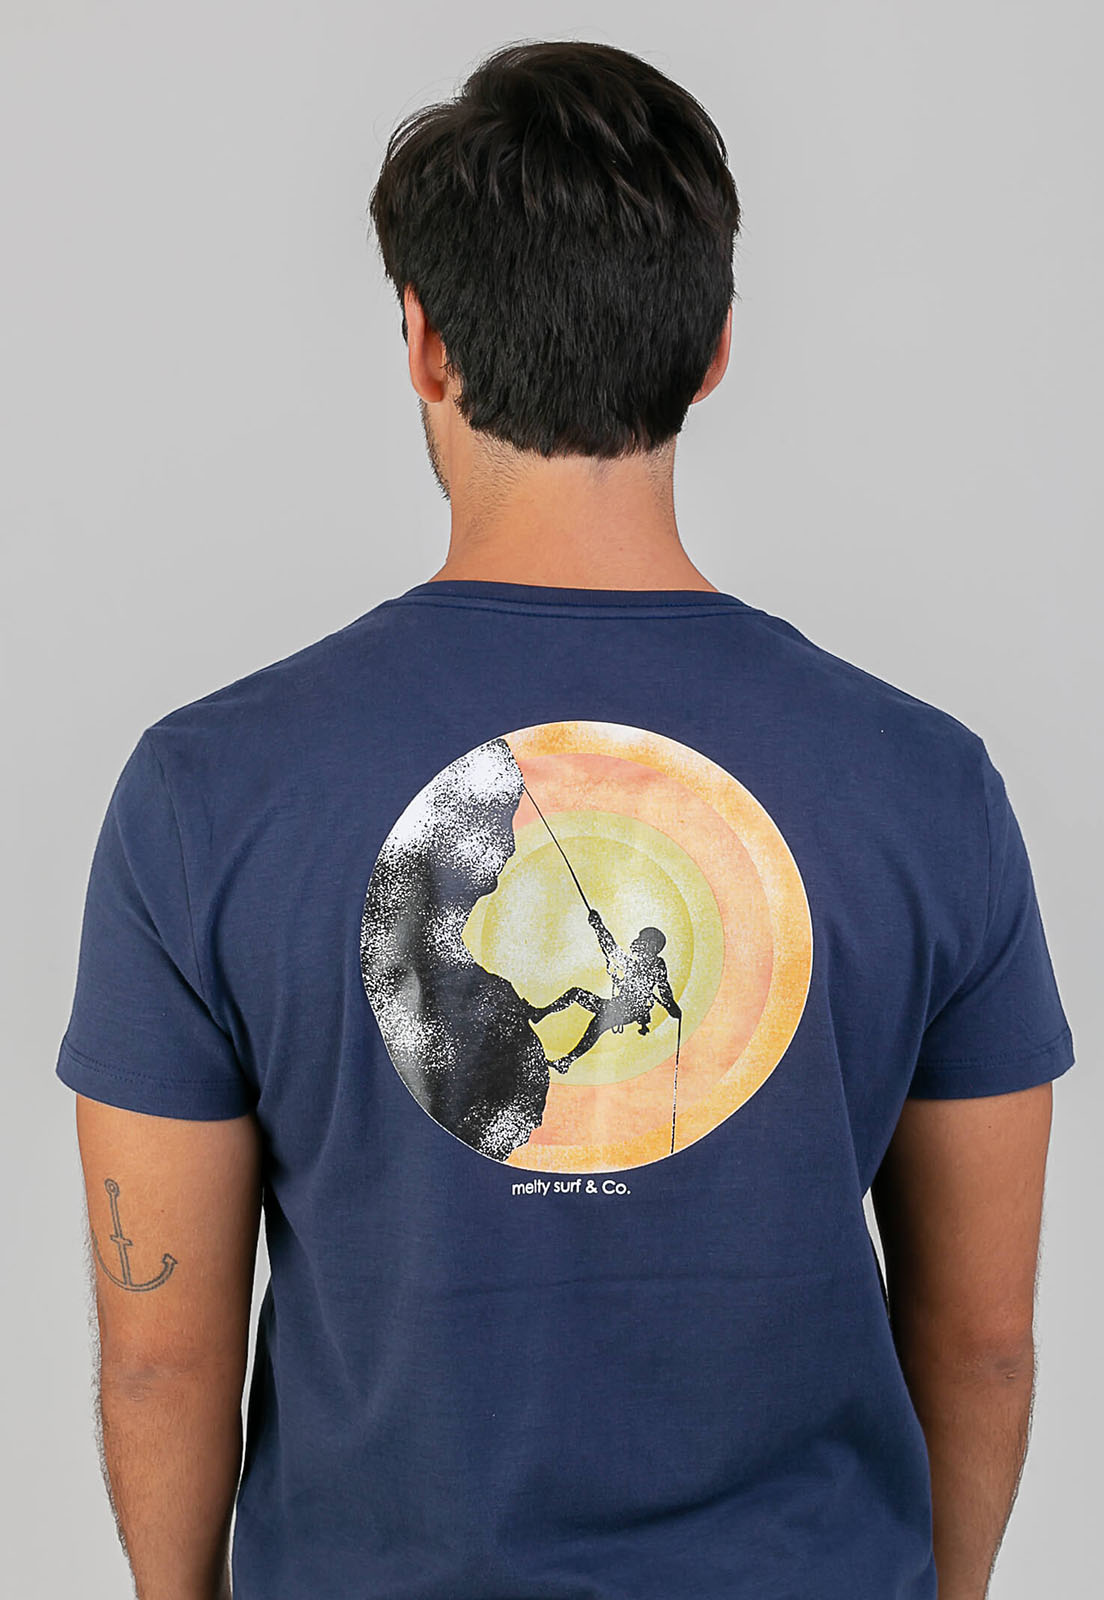 T-Shirt Kamicaze Rider preto melty  - melty surf & Co.